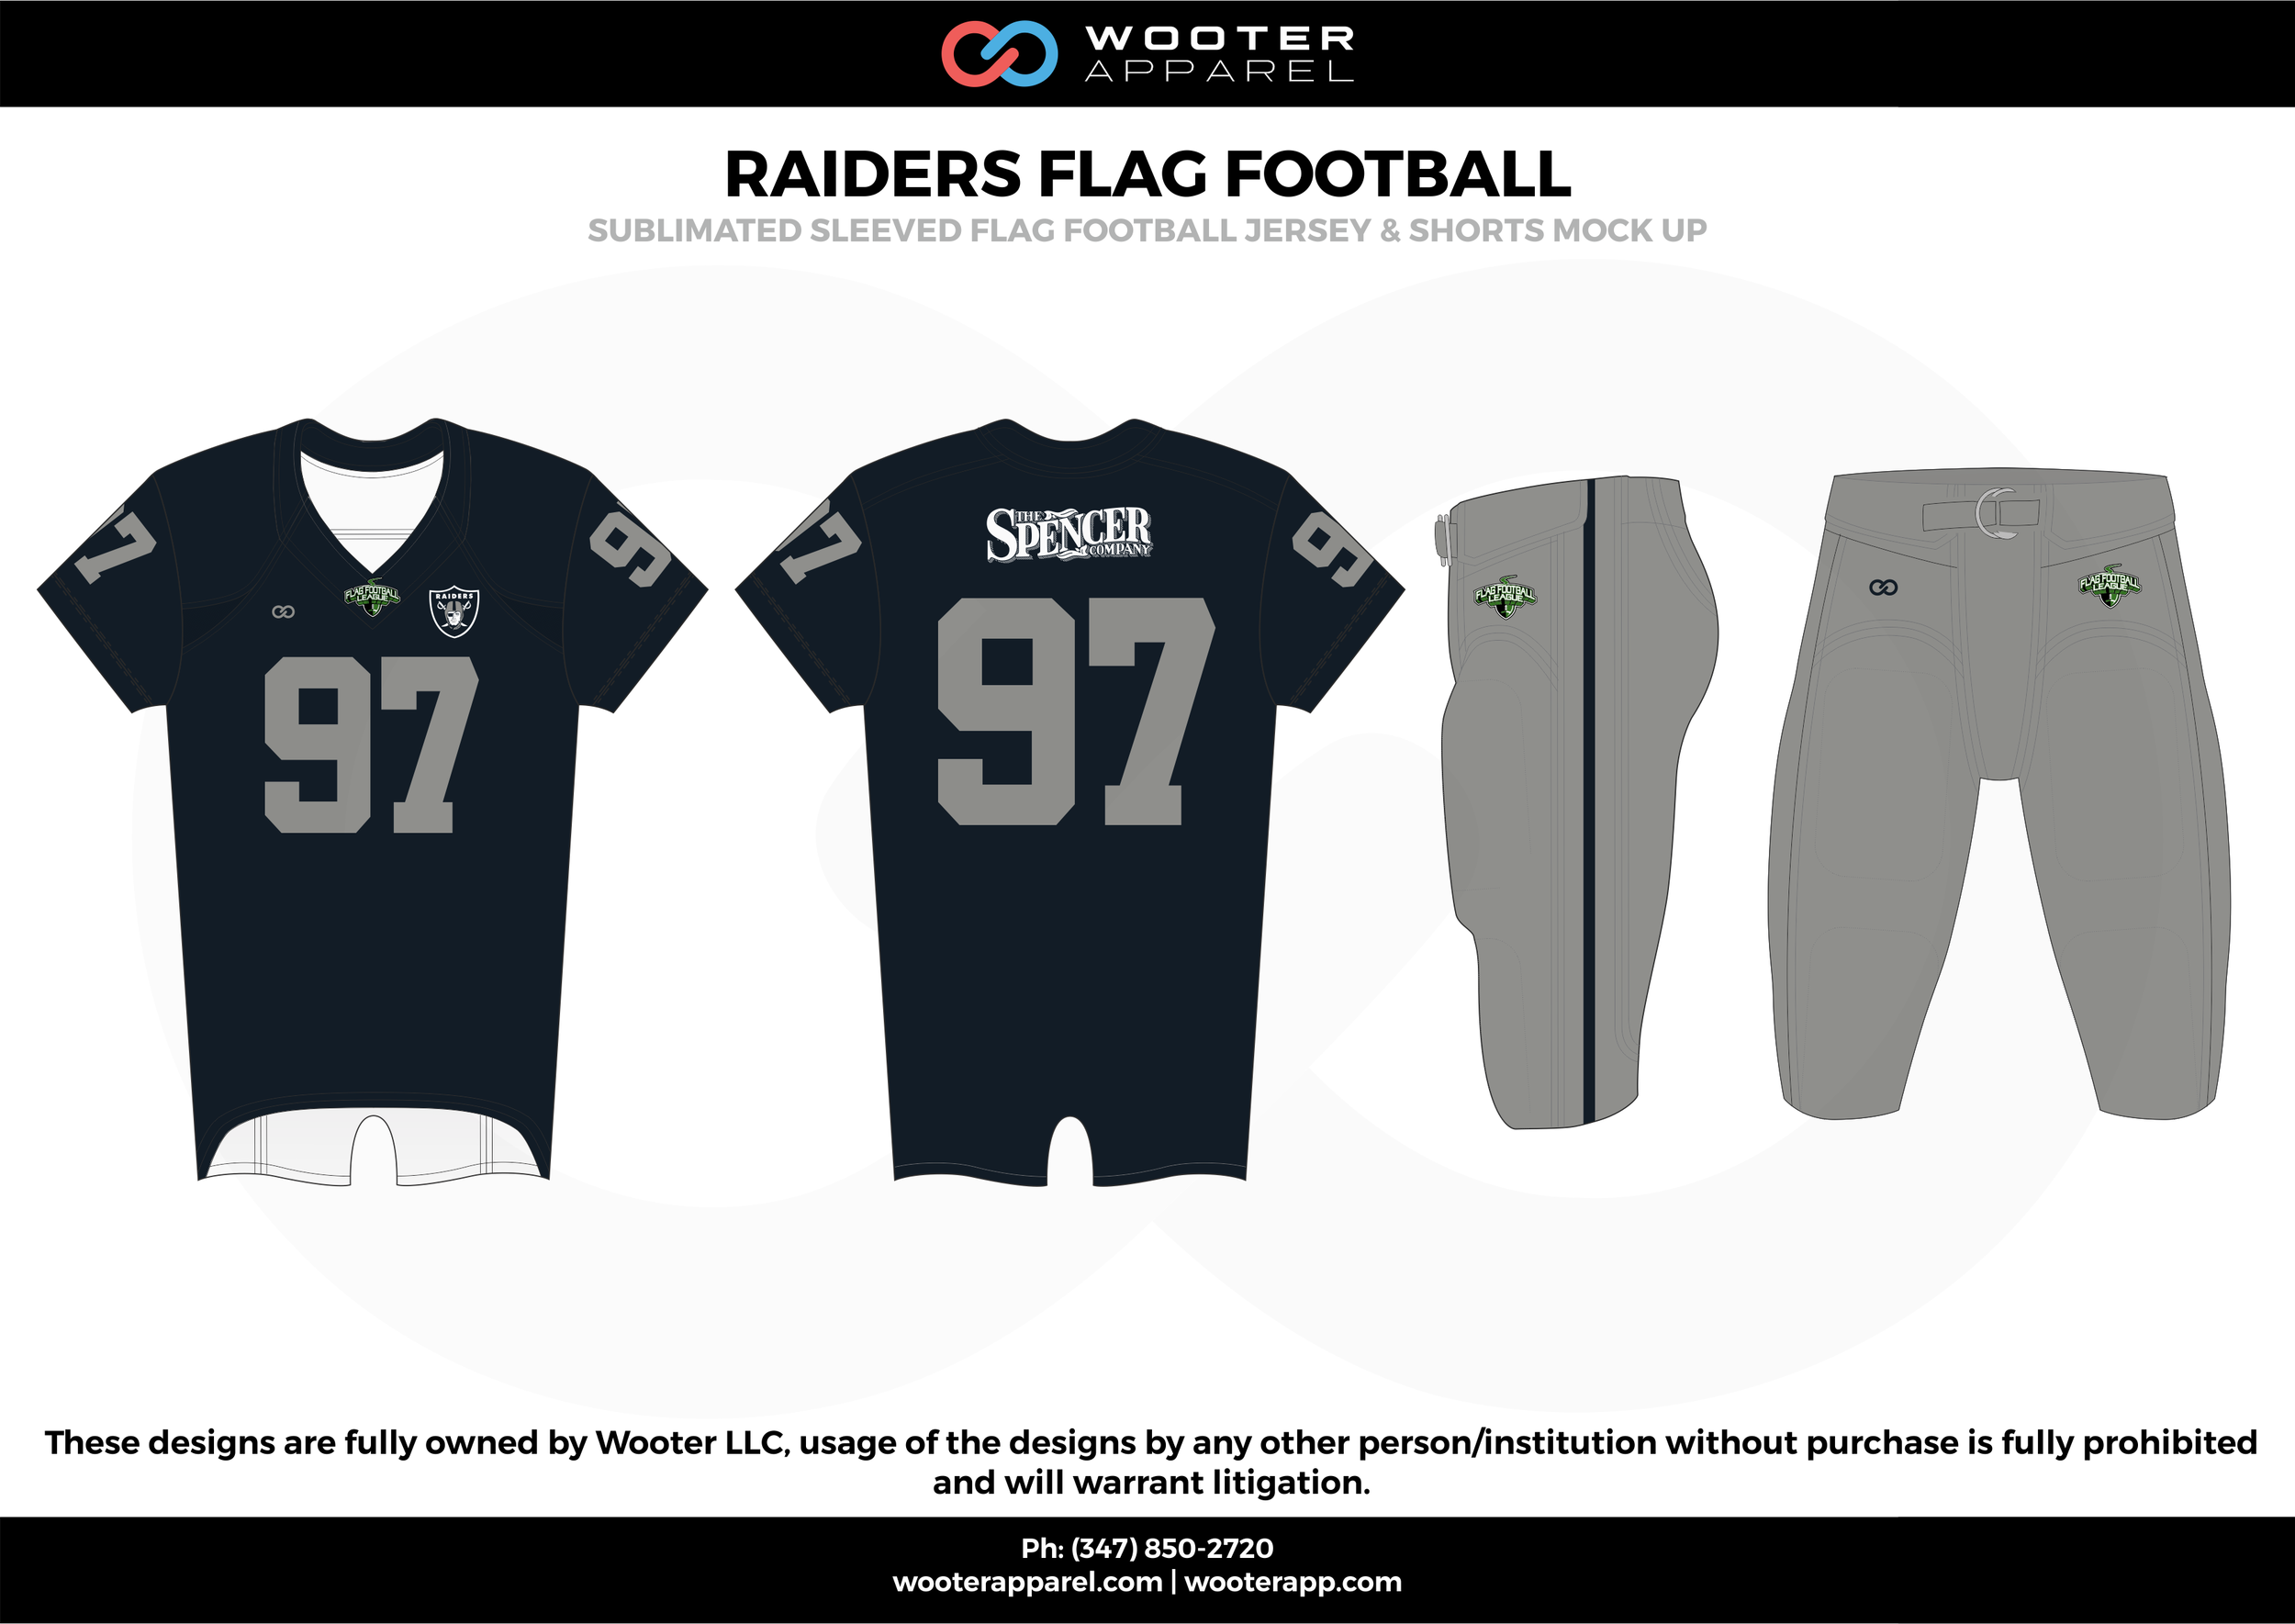 RAIDERS FLAG FOOTBALL black gray white flag football uniforms jerseys pants